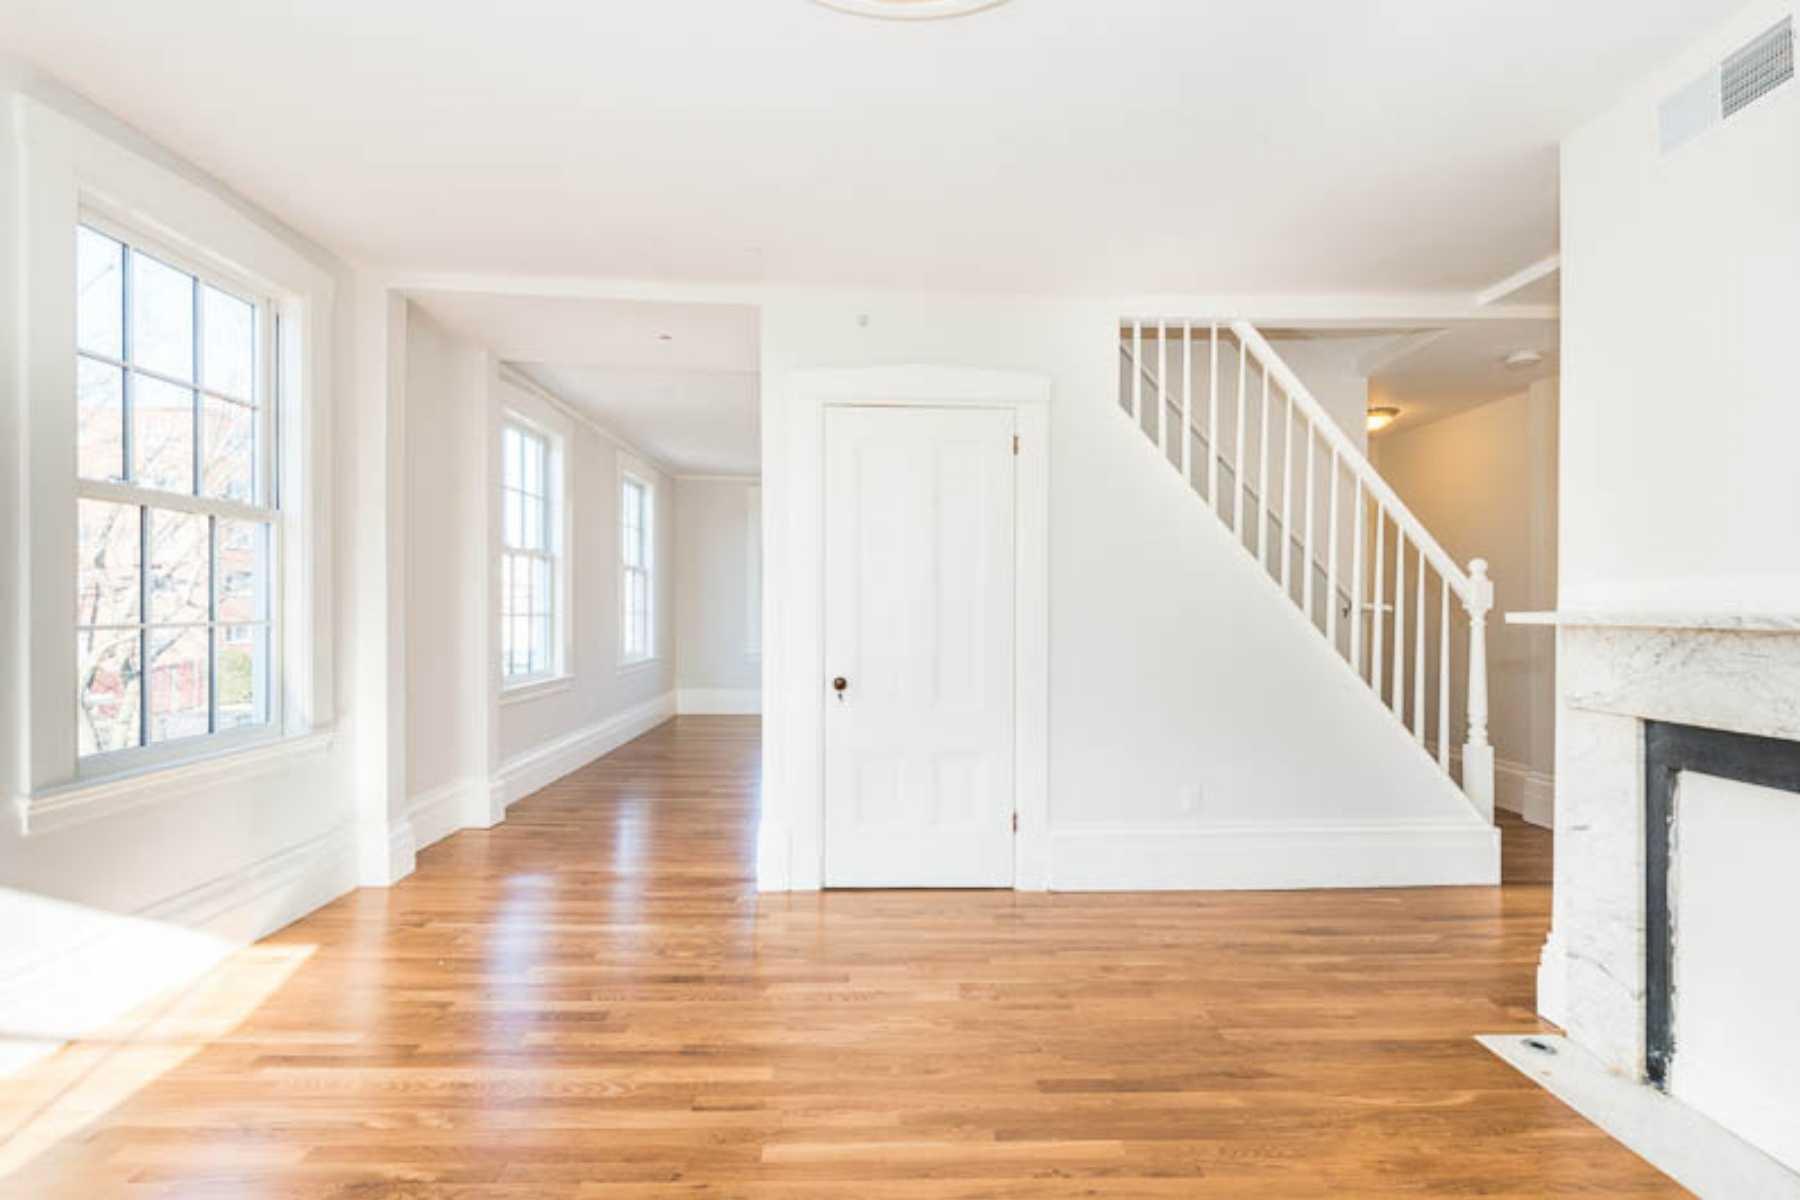 15-CapstoneCommunities-property-13 WinterStreet-Arlington.jpg